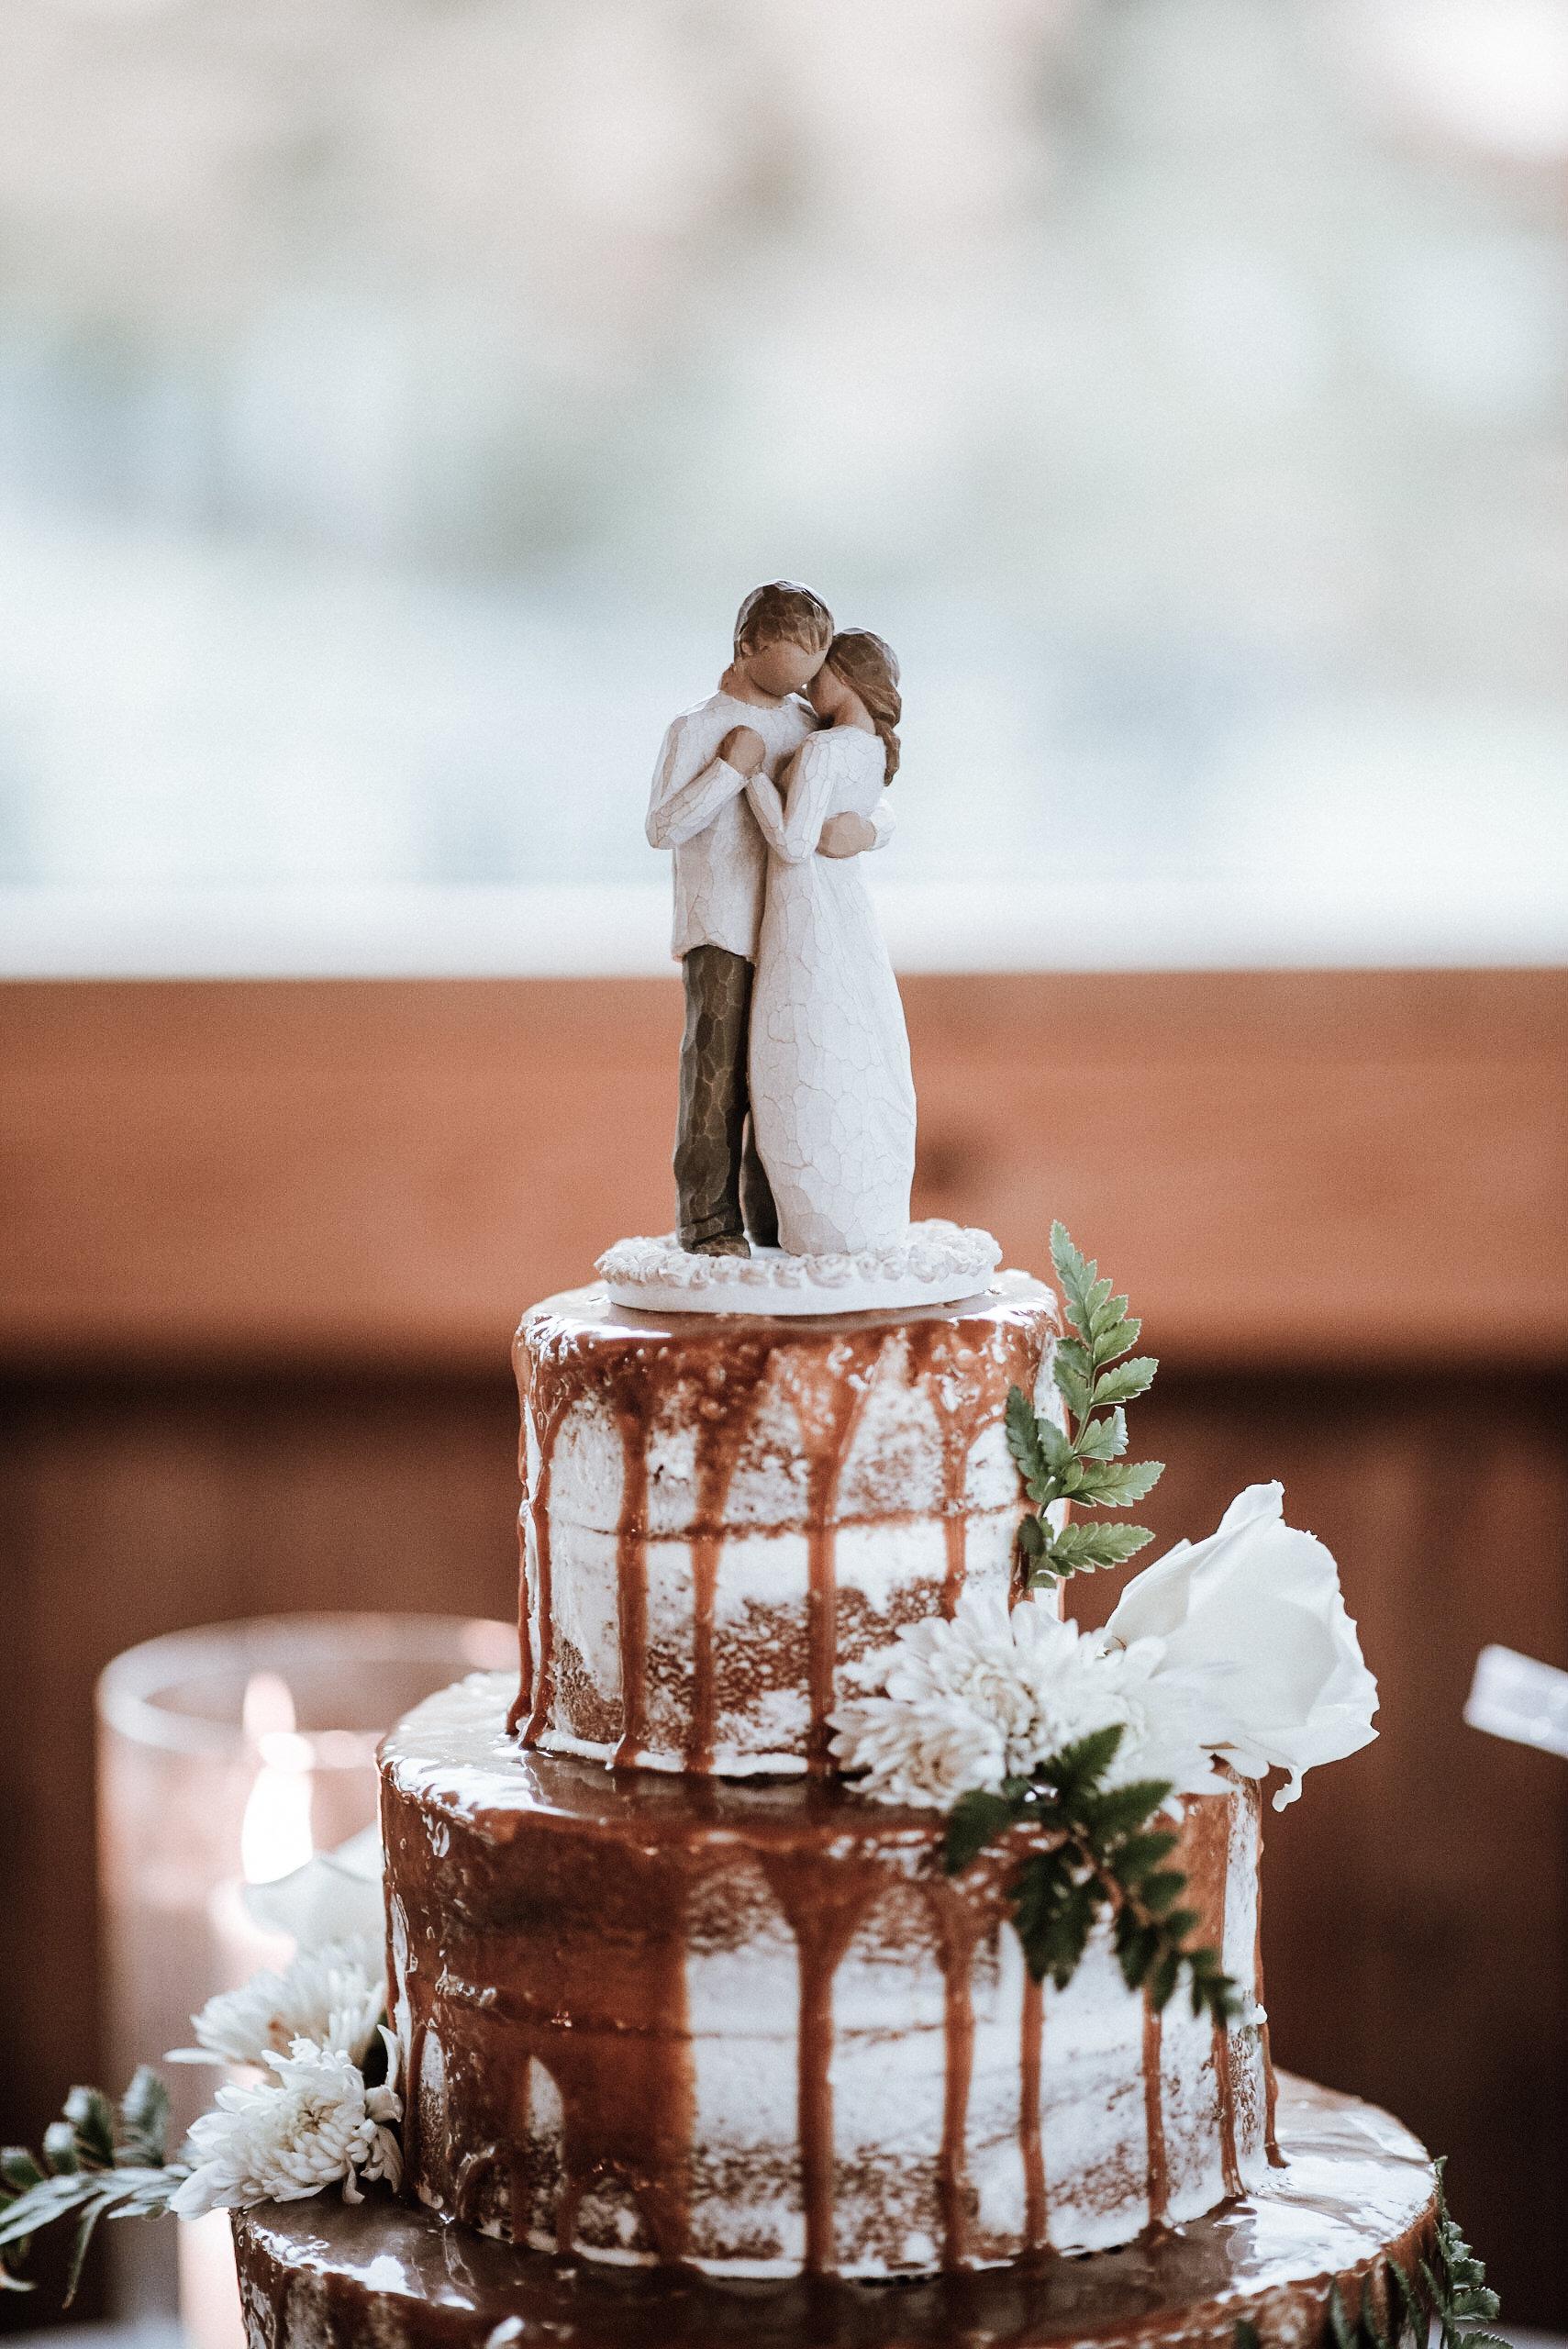 Top of wedding cake